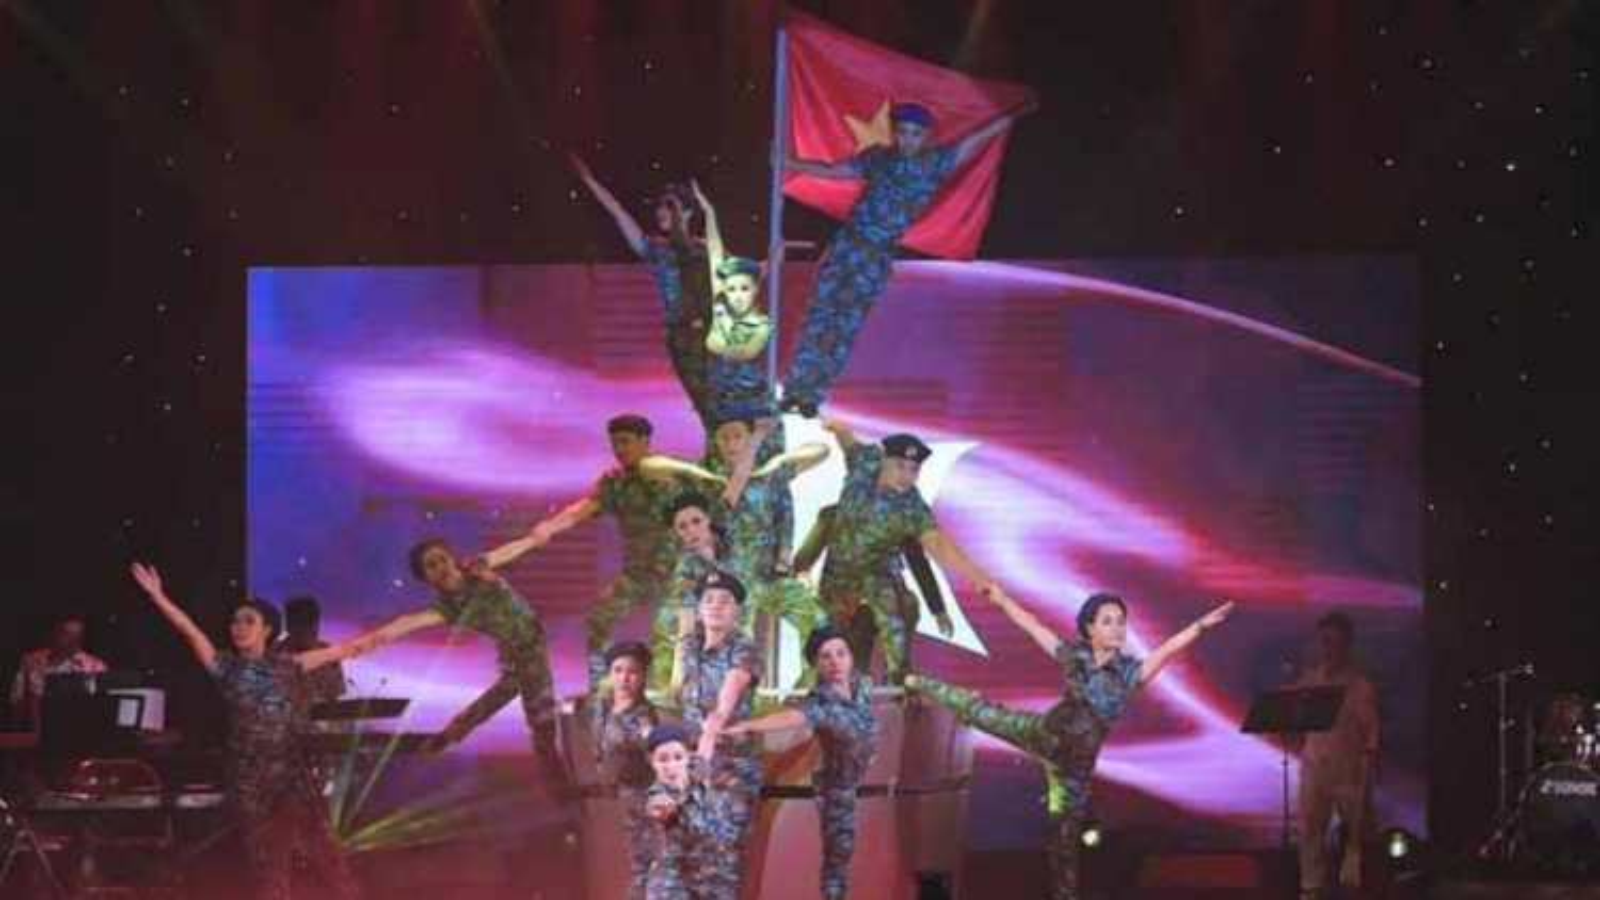 ASEAN Music Festival poised to get underway in Haiphong